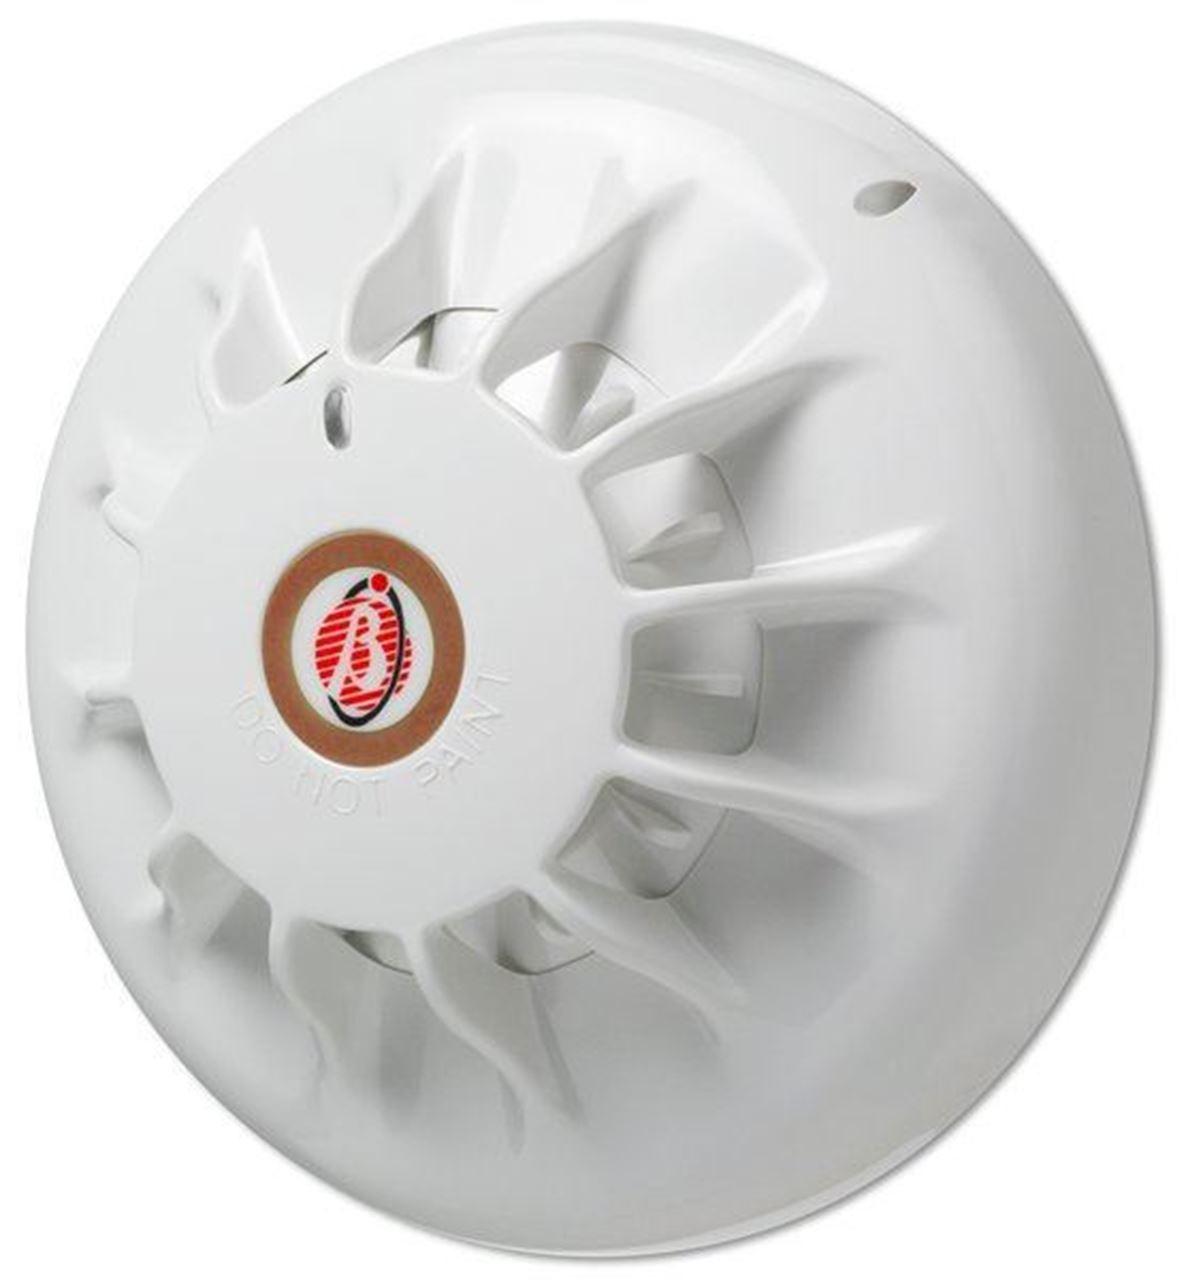 Bentel security FC400CH - Multi-Sensor CO and Heat Detector Armenia Vantag